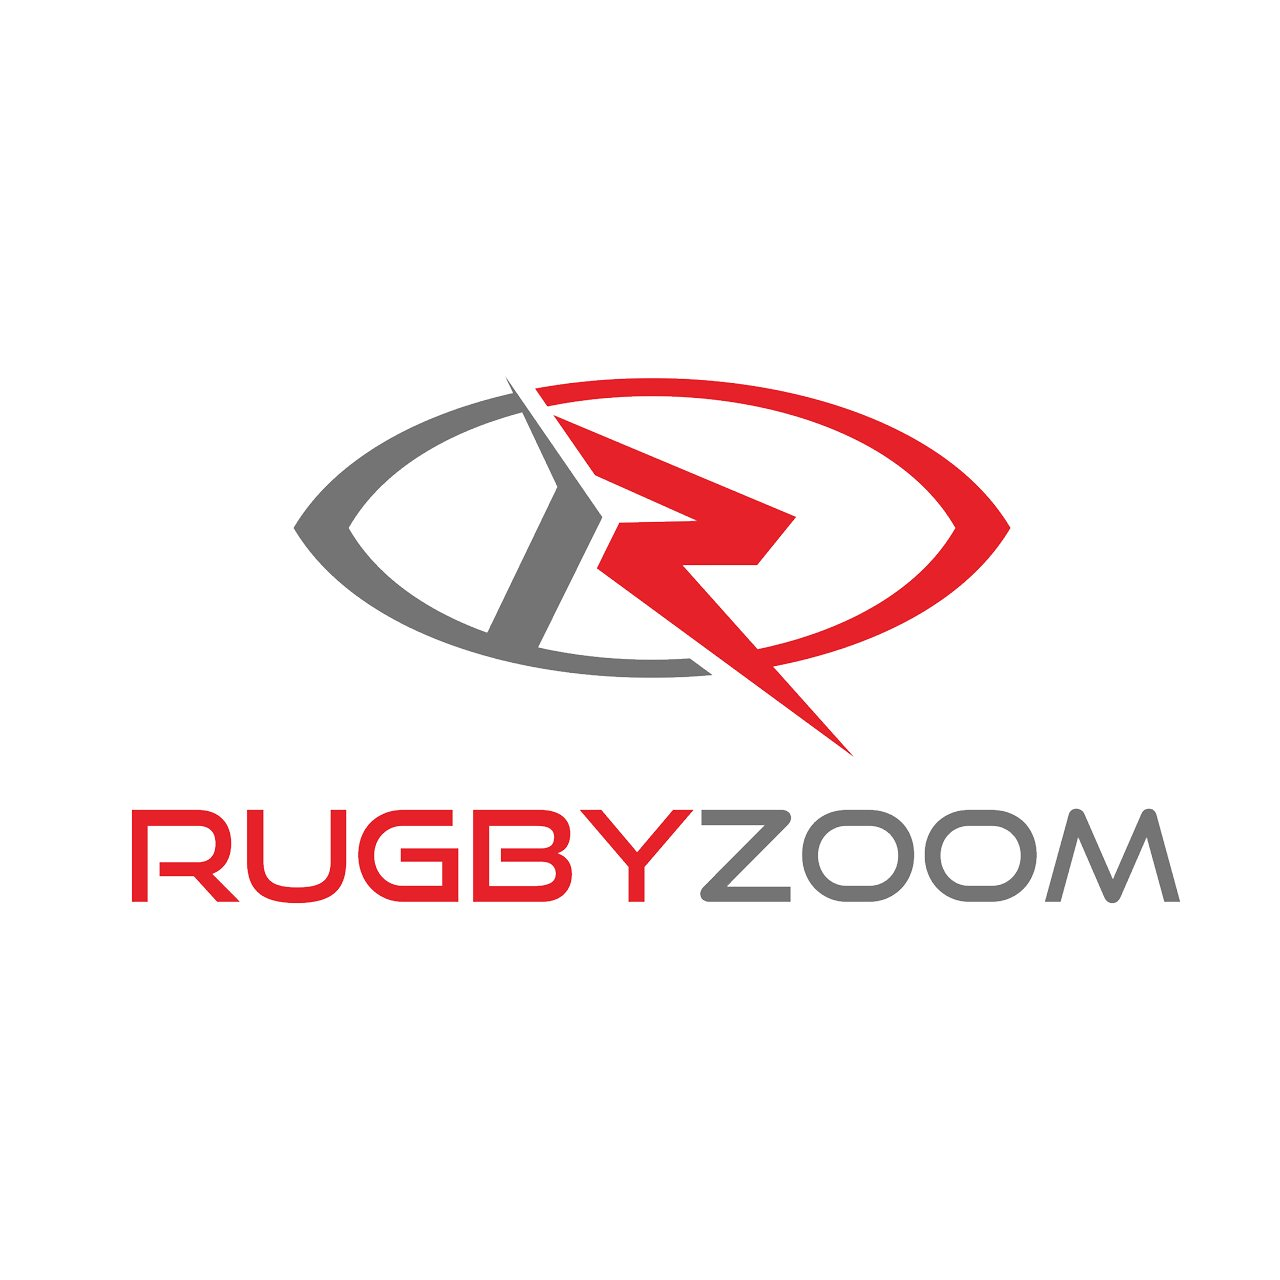 RugbyZoom